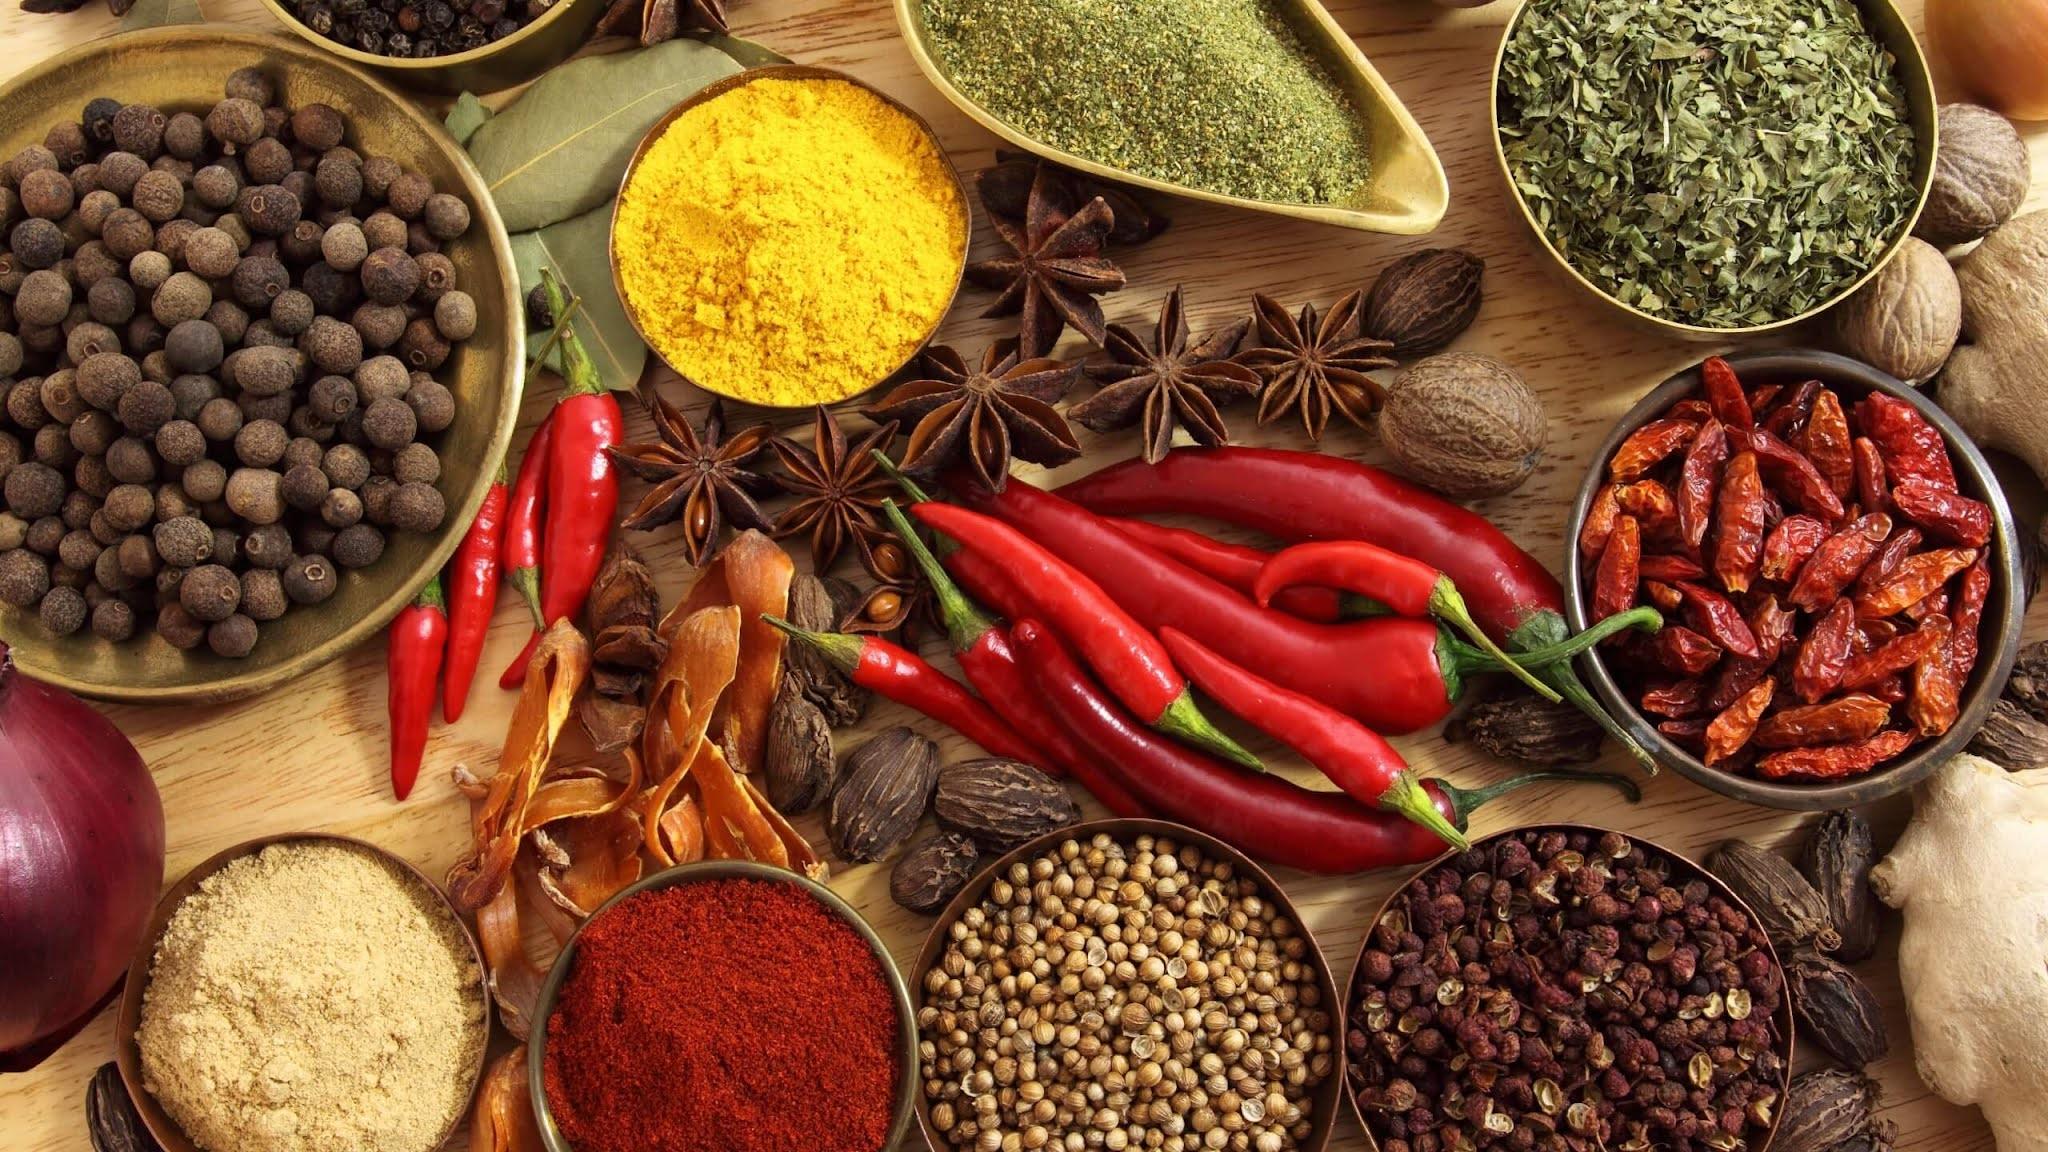 Spice wholesaler